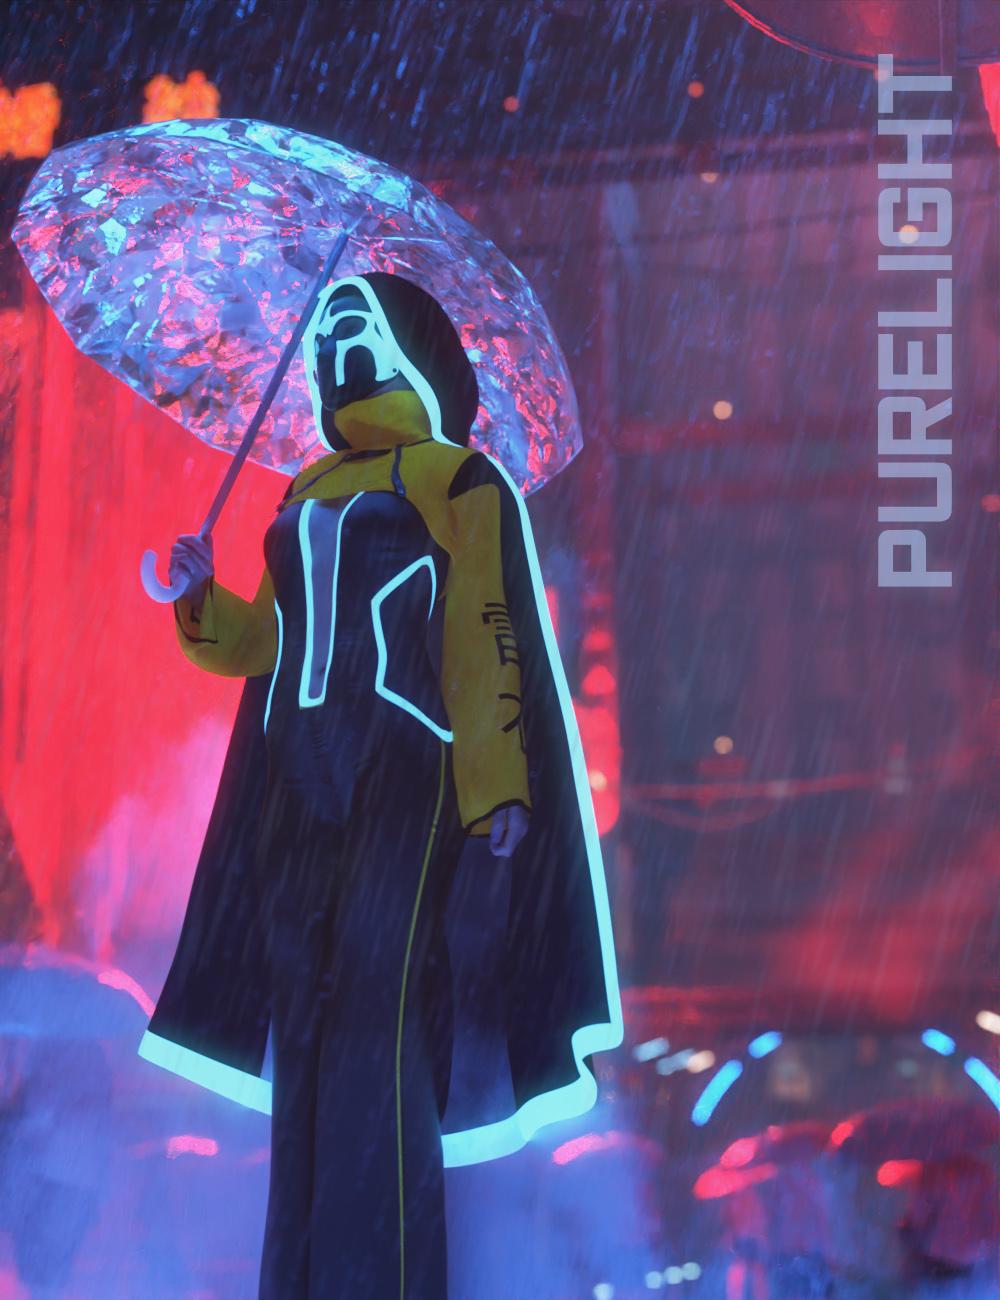 PureLight Cyberpunk by: KindredArts, 3D Models by Daz 3D